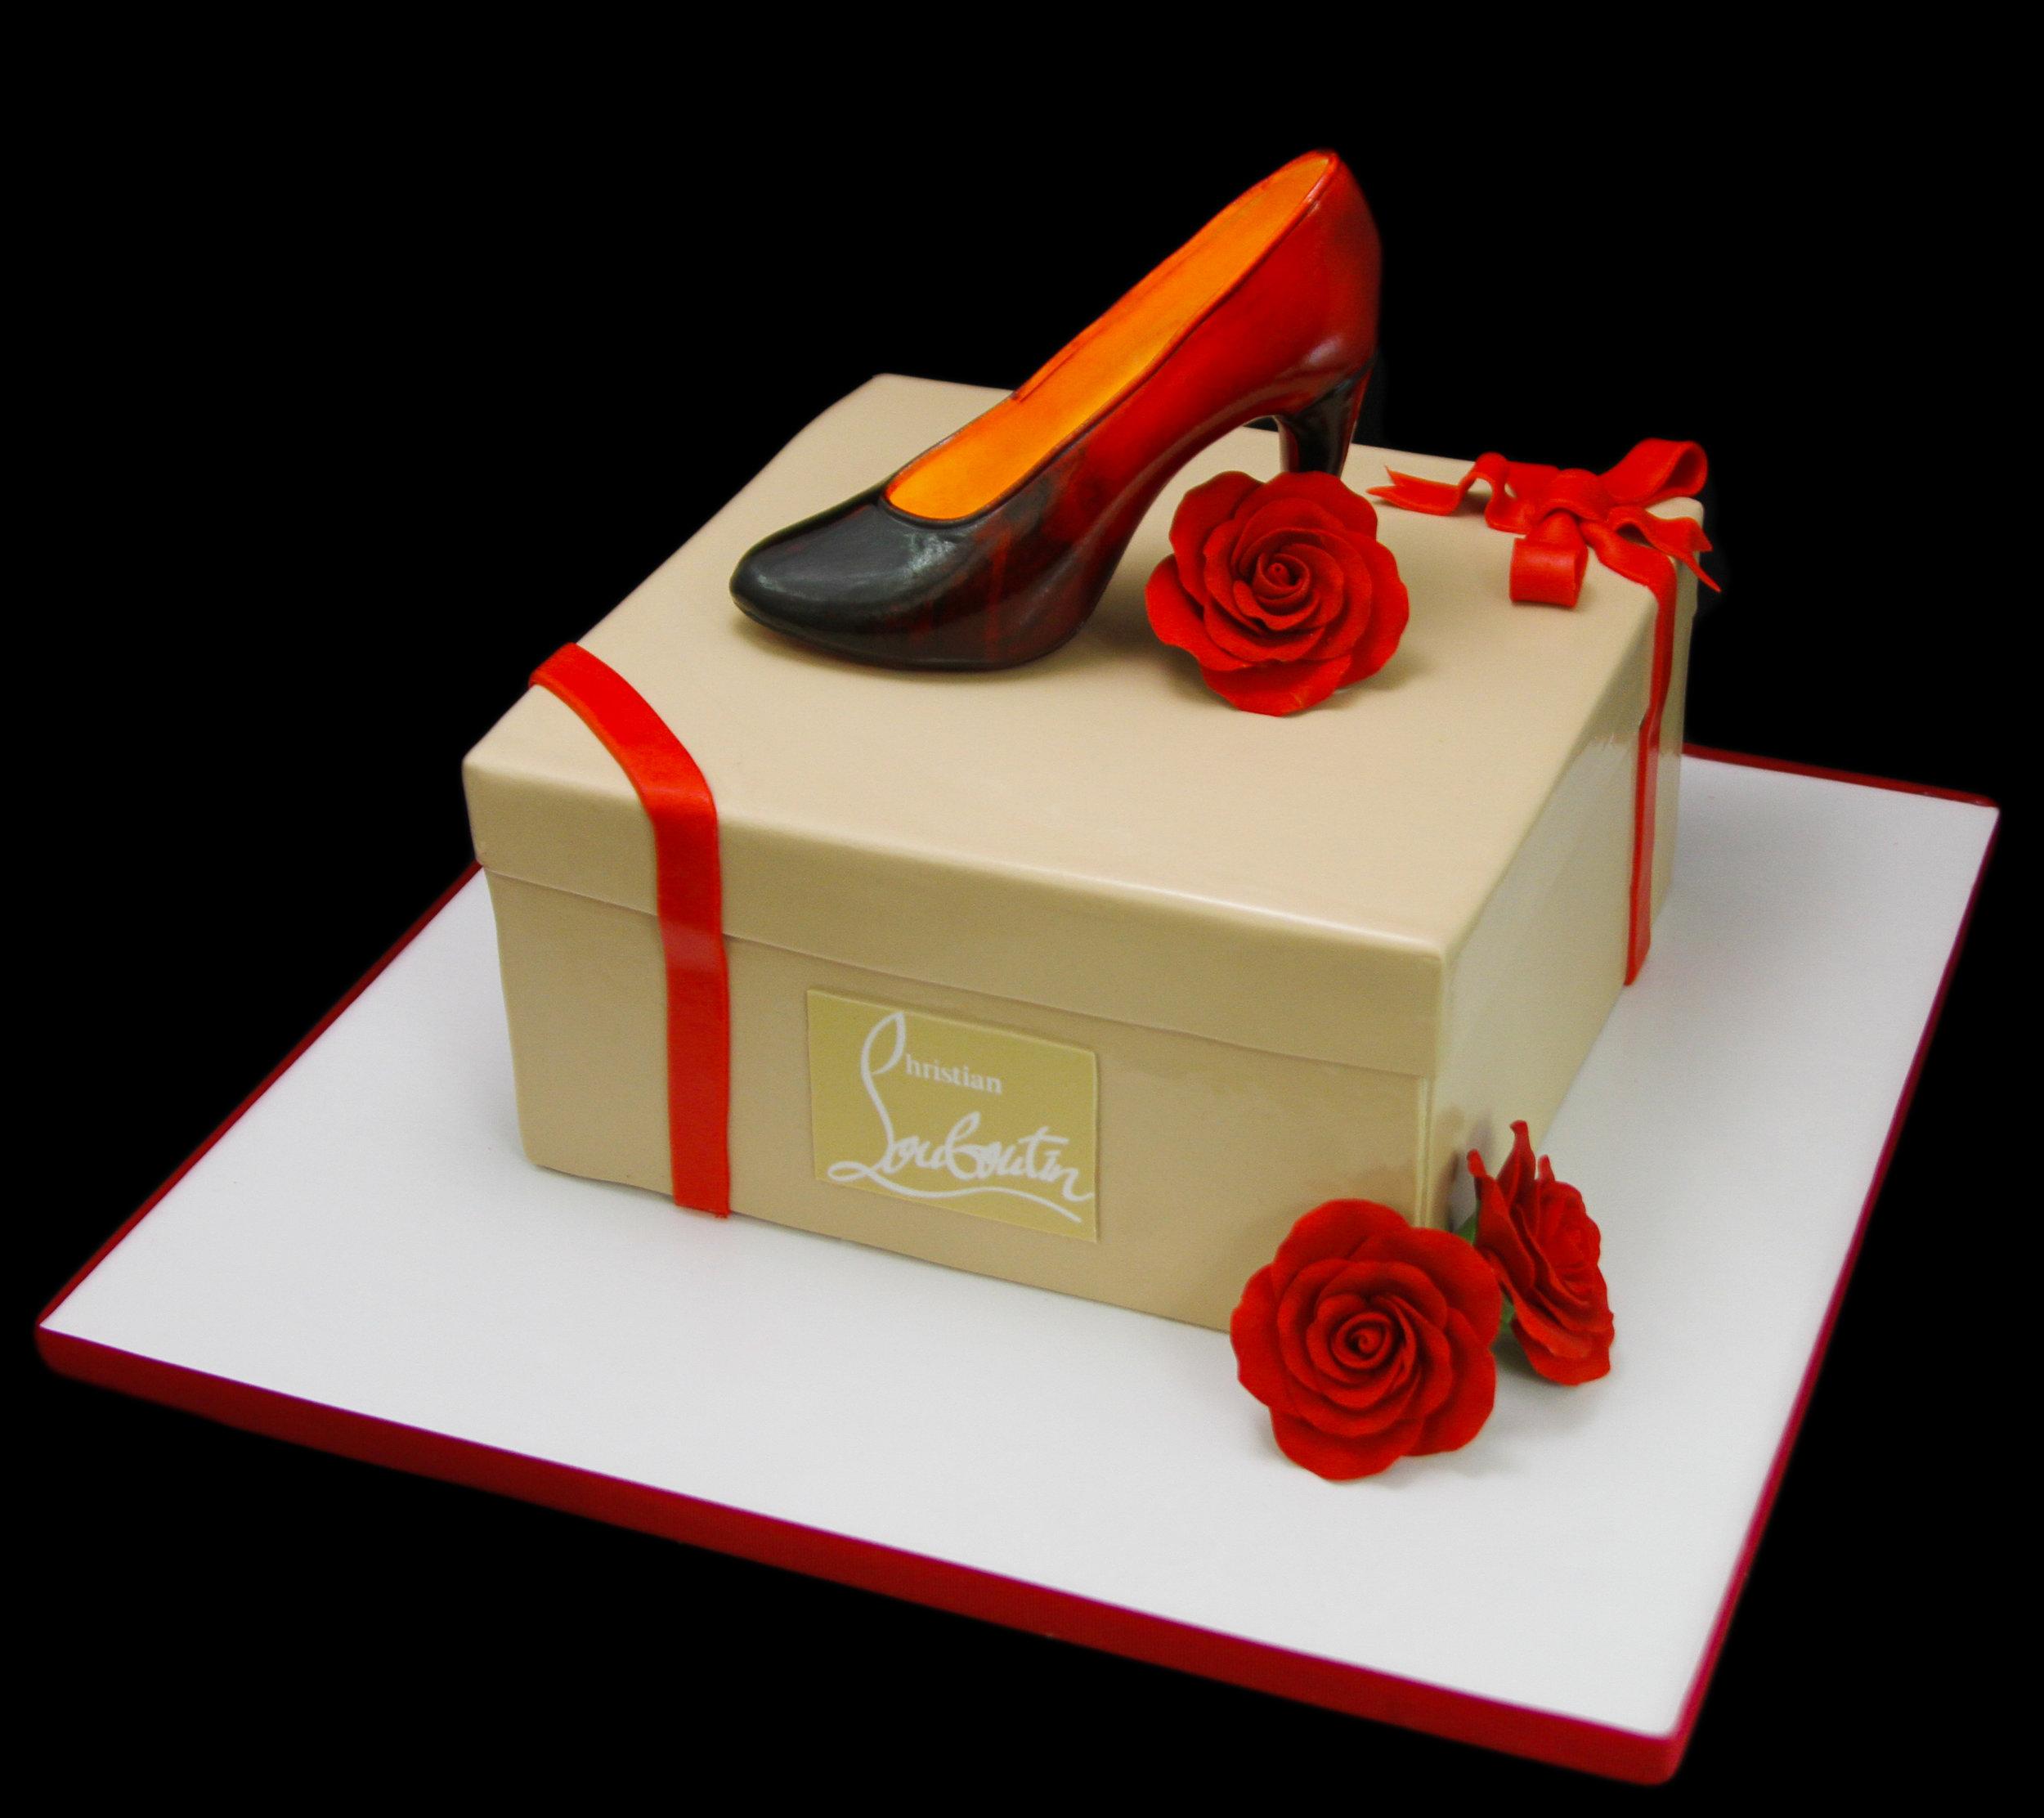 Christian Louboutin Ombre Shoe on a Shoebox Cake.jpg